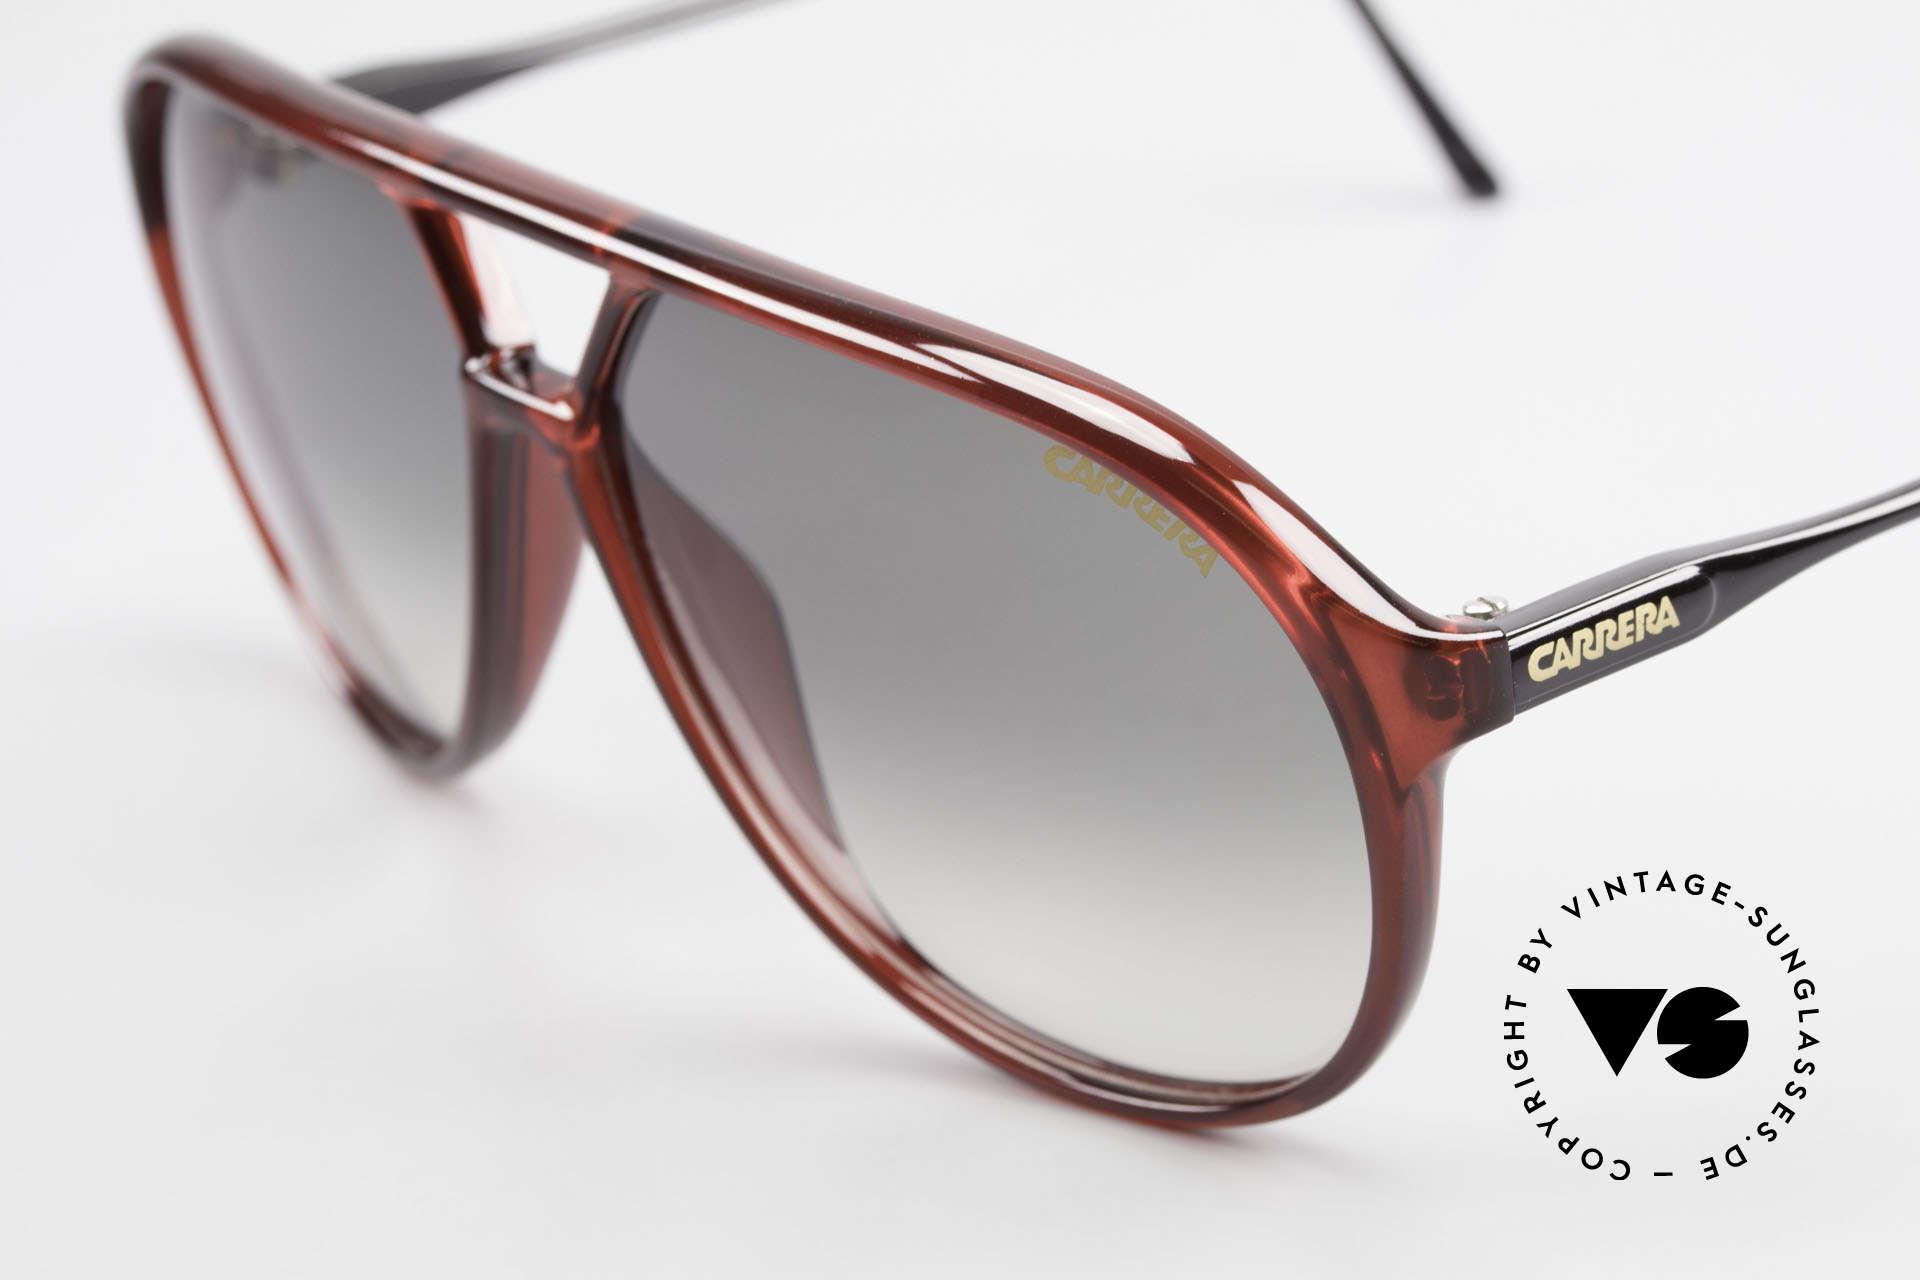 Carrera 5425 Robert De Niro Sunglasses 90's, 2 sets of lenses: 1x green gradient, 1x brown Ultrasight, Made for Men